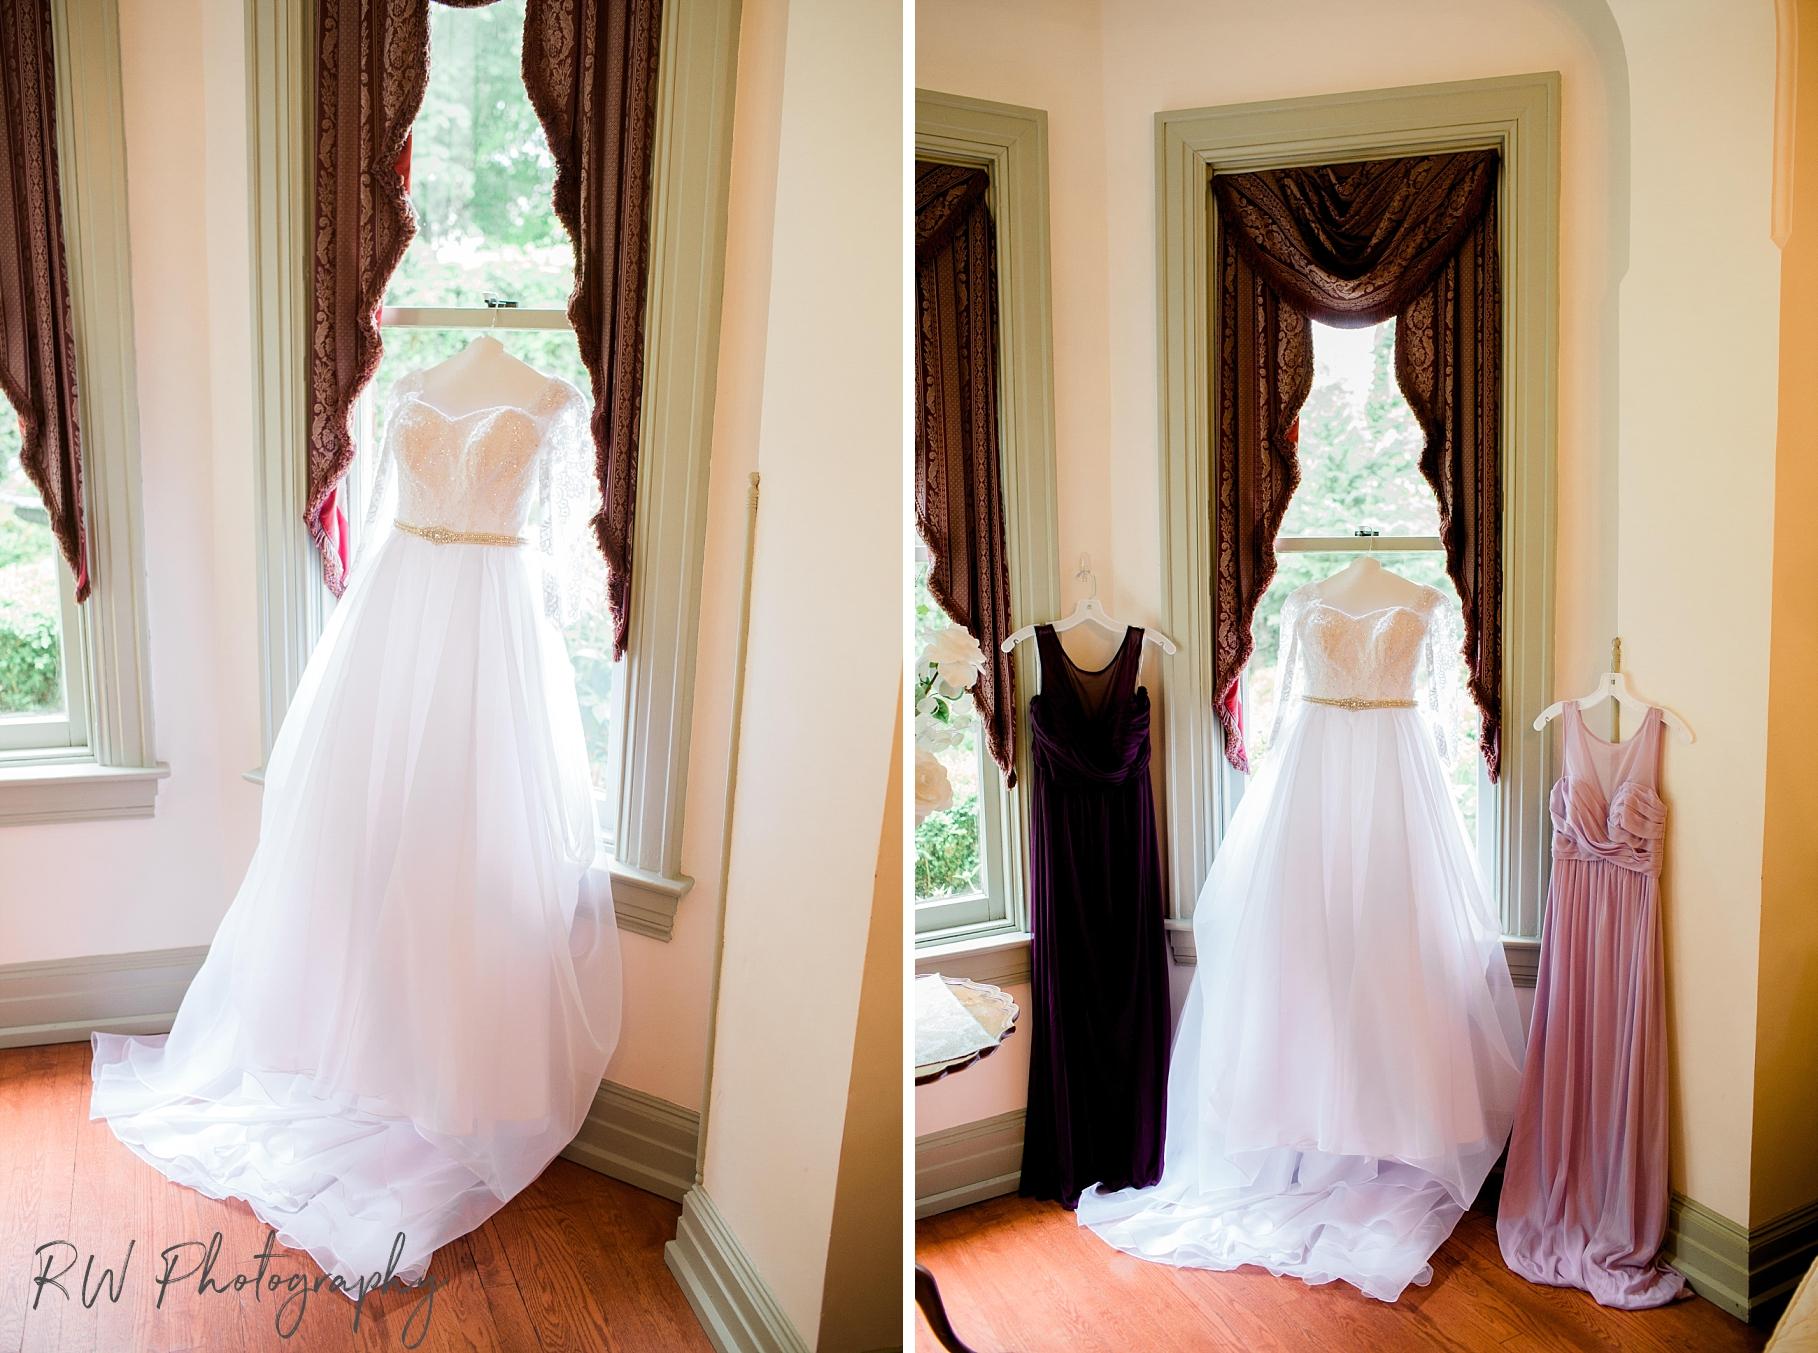 One of my favorite wedding dress shots